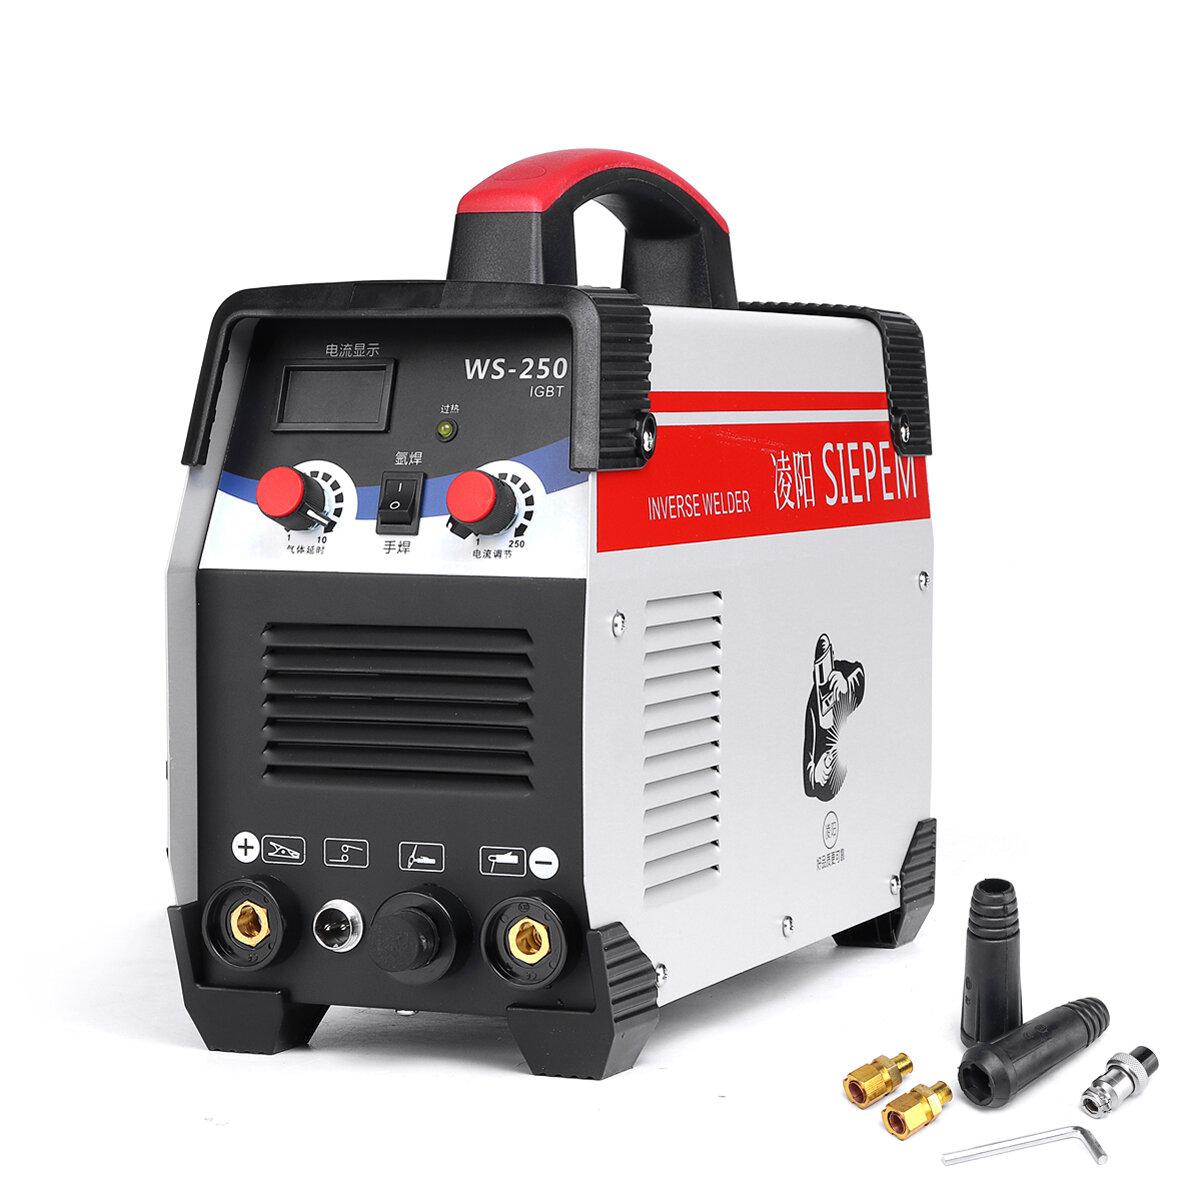 WS-250 250A 220V ARC/TIG 2 In 1 Welding Machine Portable IGBT Inverter Weilding Tools